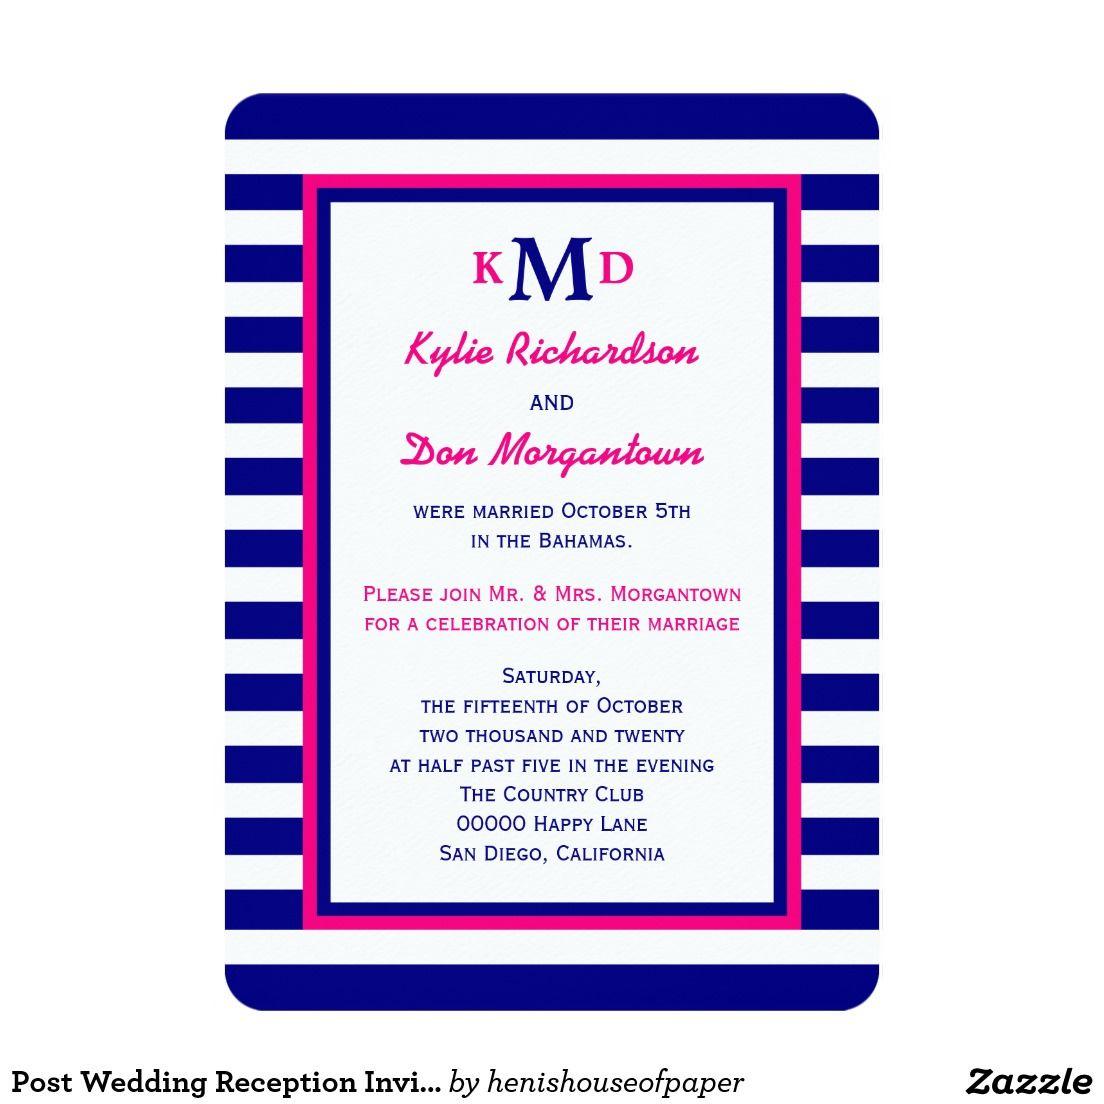 Post Wedding Reception Invitation Pink Nautical | Wedding reception ...